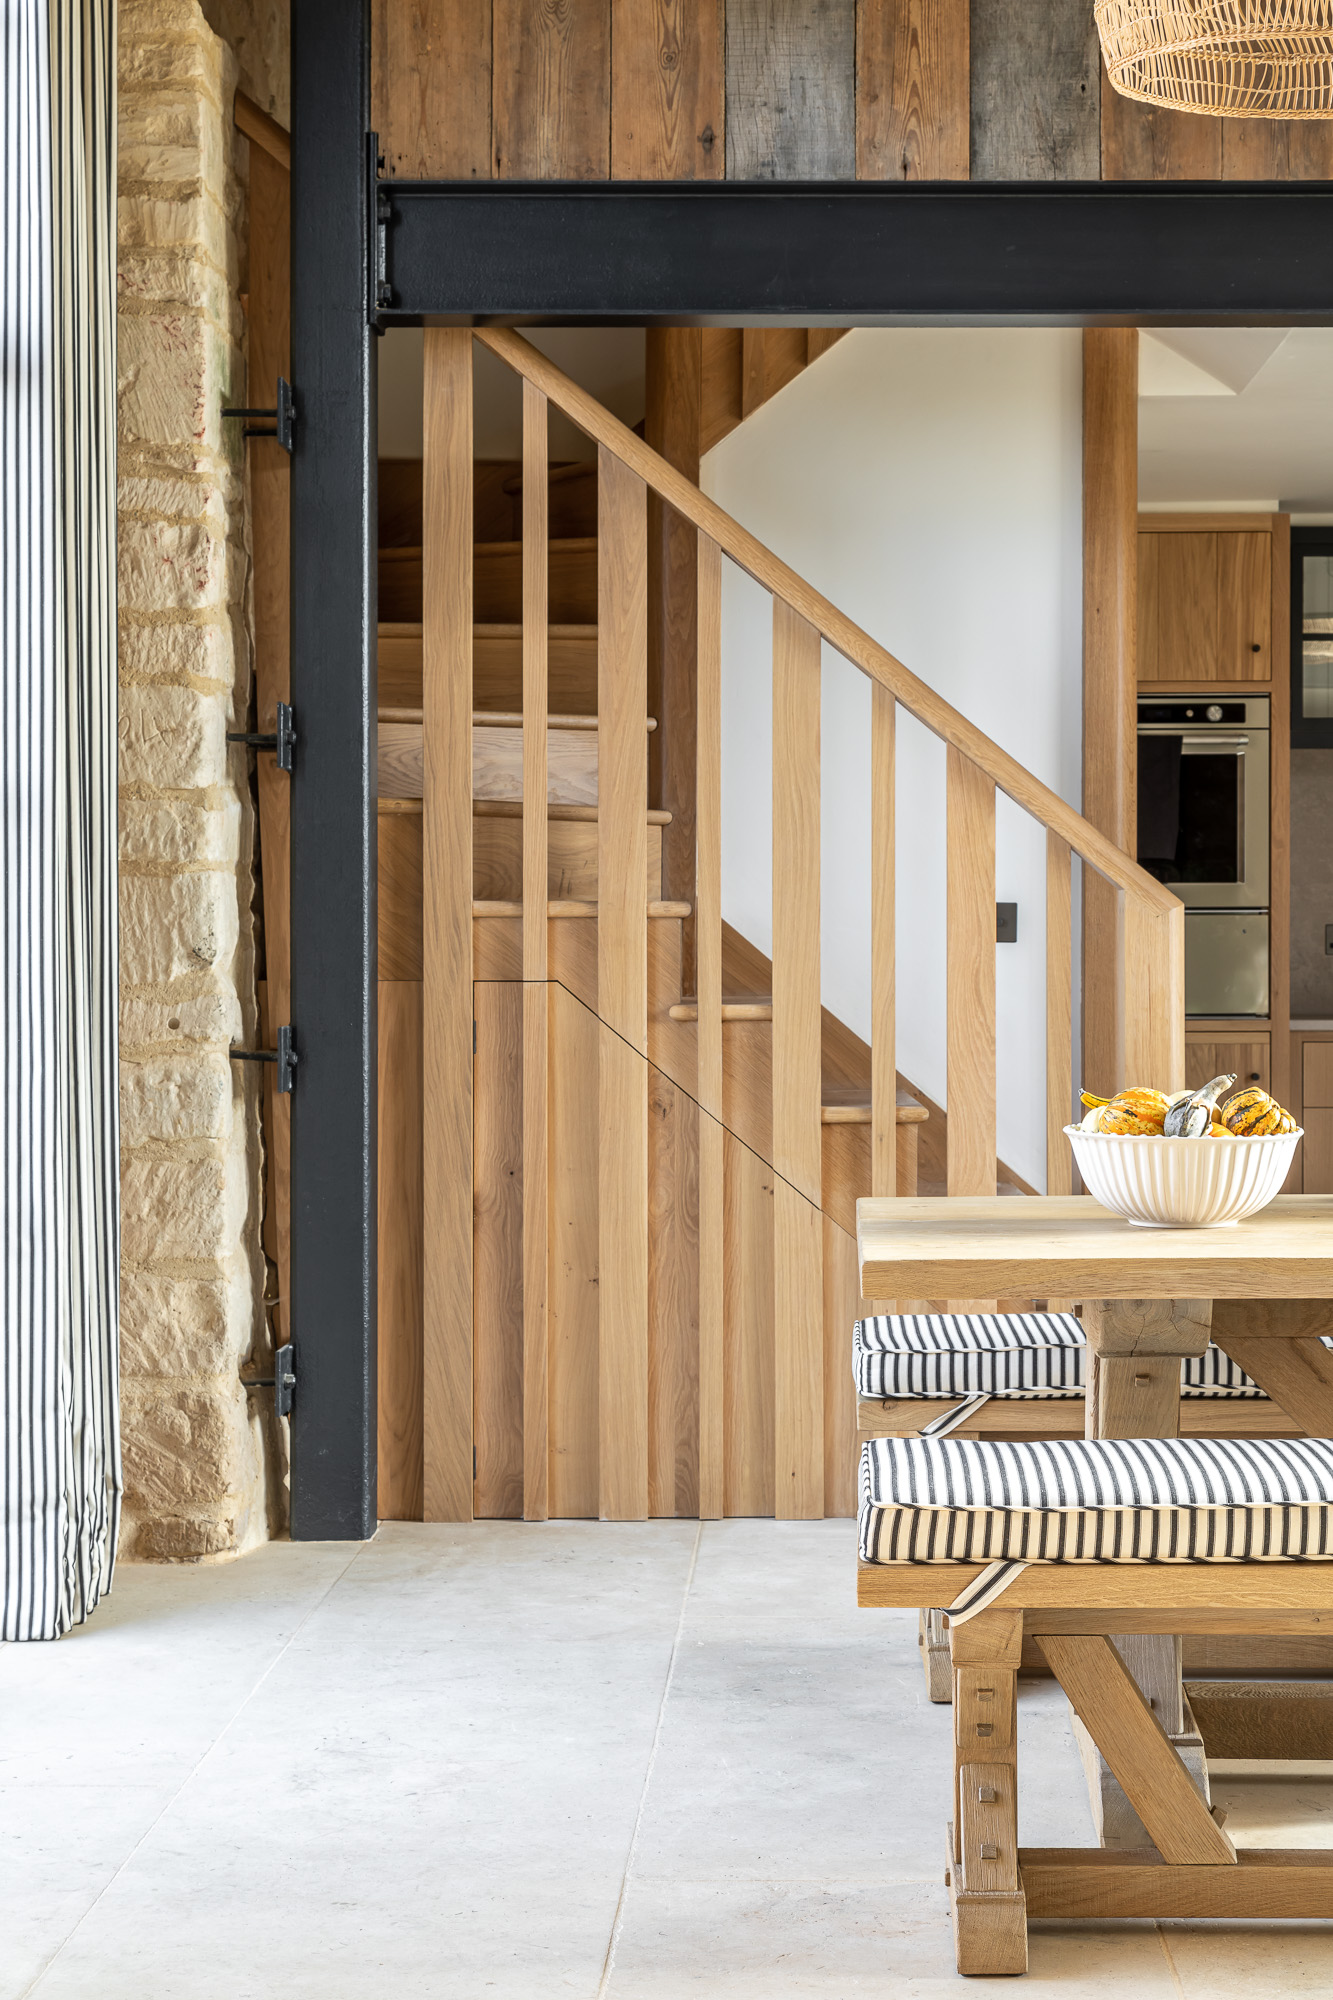 jonathan bond, interior photographer, wooden stairs & banisters, marnhull, dorset